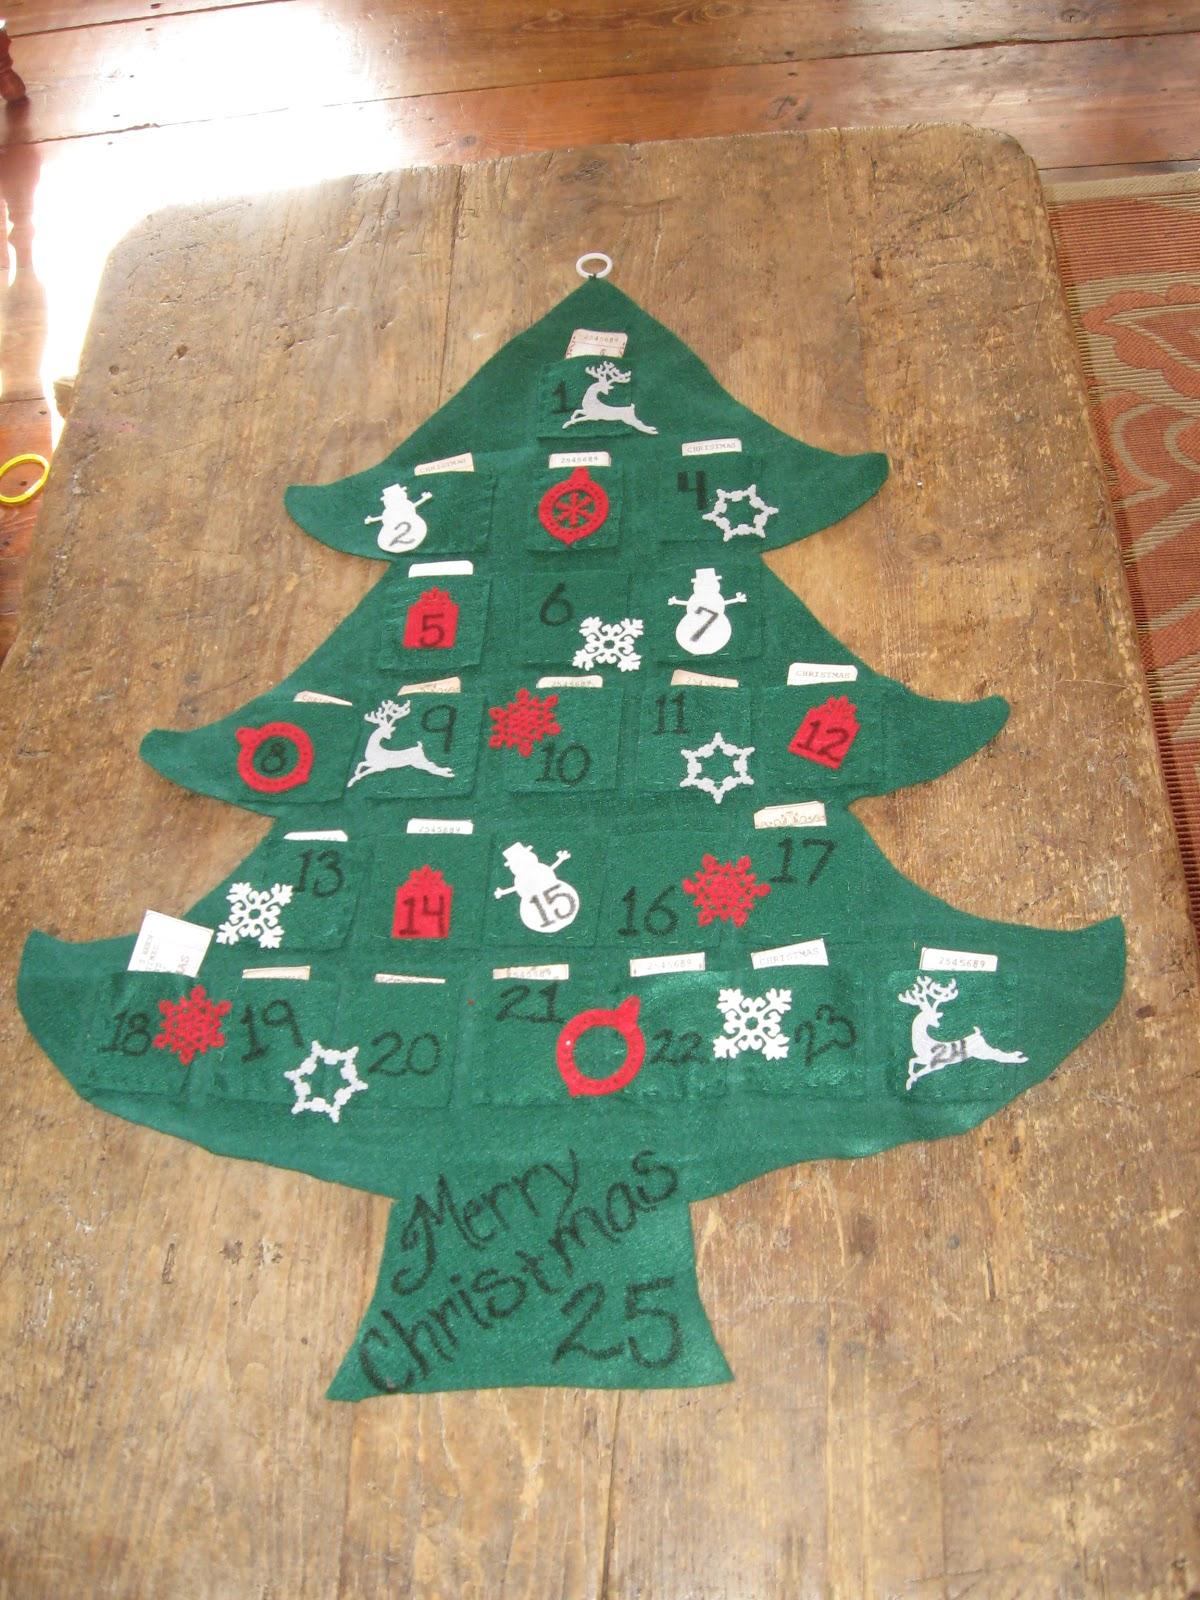 aprons and apples felt christmas tree advent calendar kids felt play tree in one. Black Bedroom Furniture Sets. Home Design Ideas